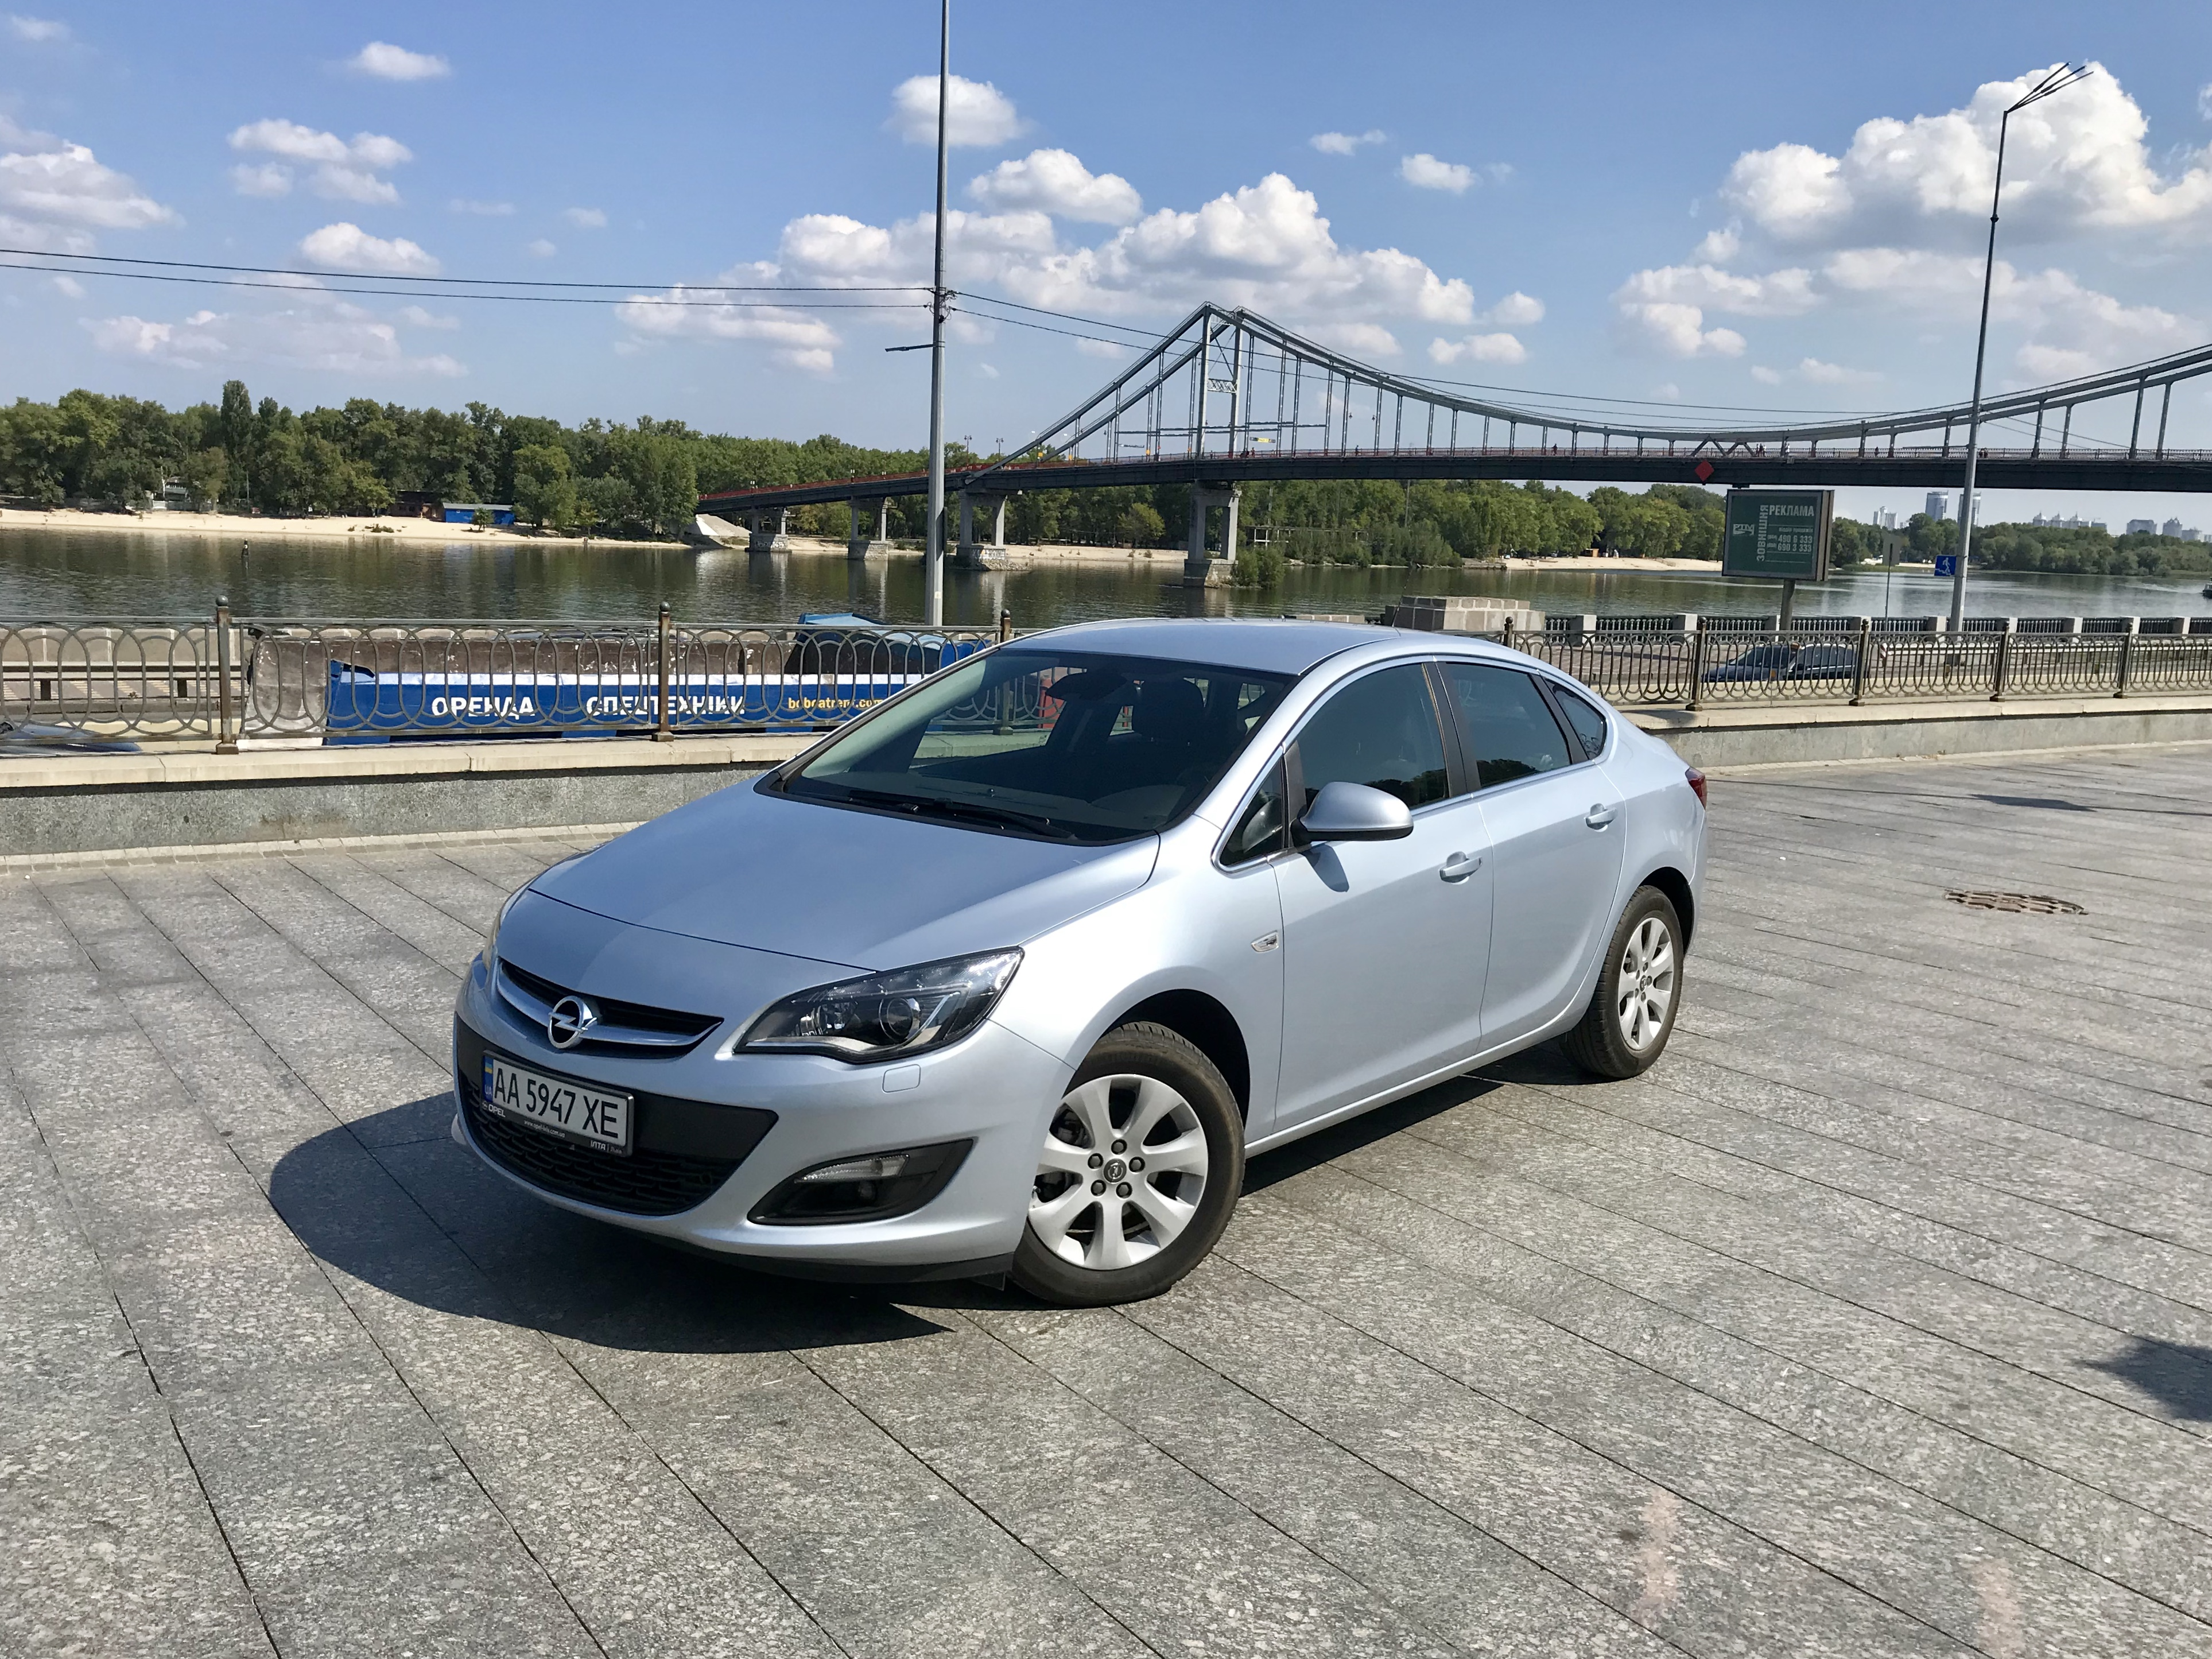 Тест-драйв Opel Astra J Sedan как аргумент за что любить Opel